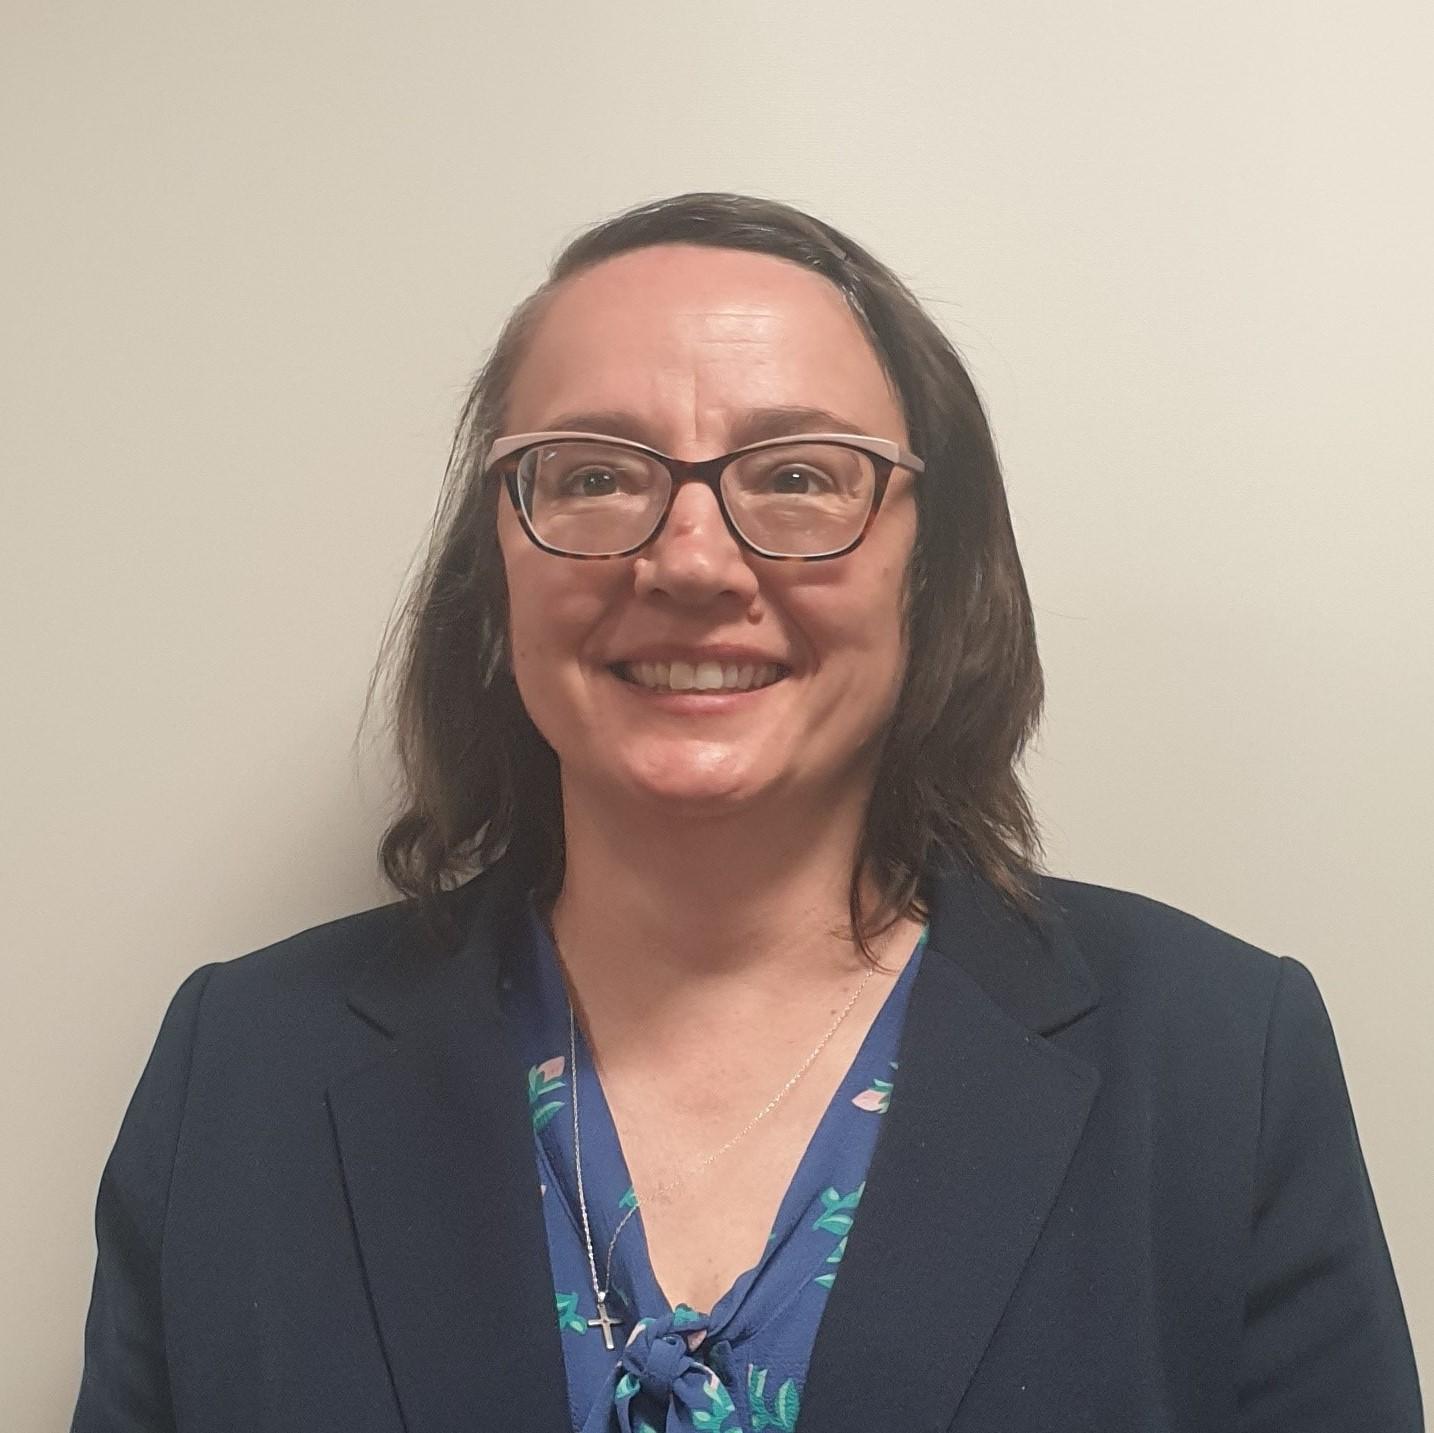 profile picture of emma pomfret